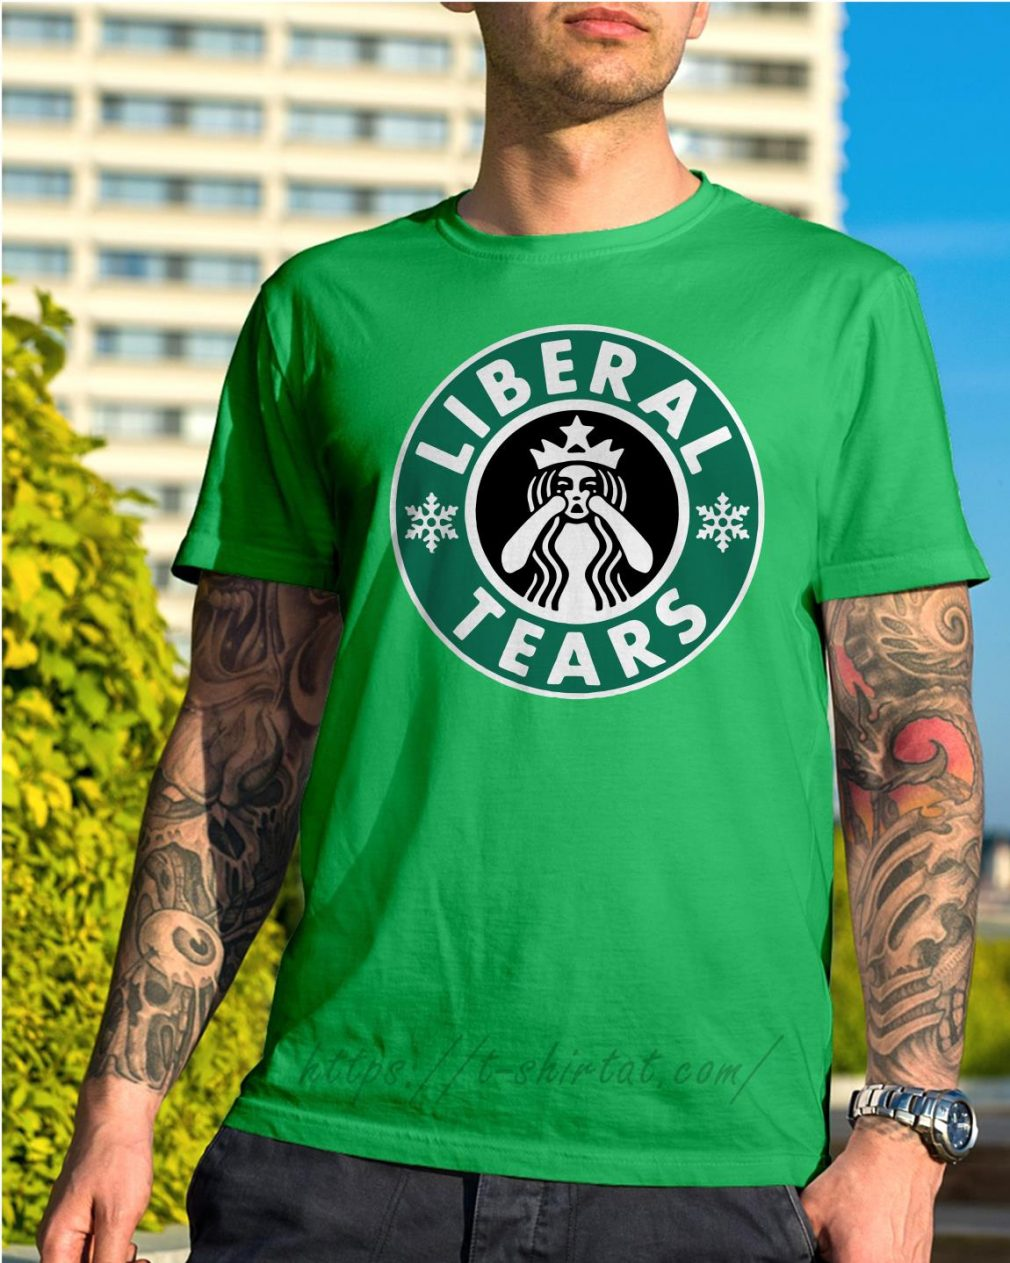 Crying Starbucks Liberal tears Shirt green